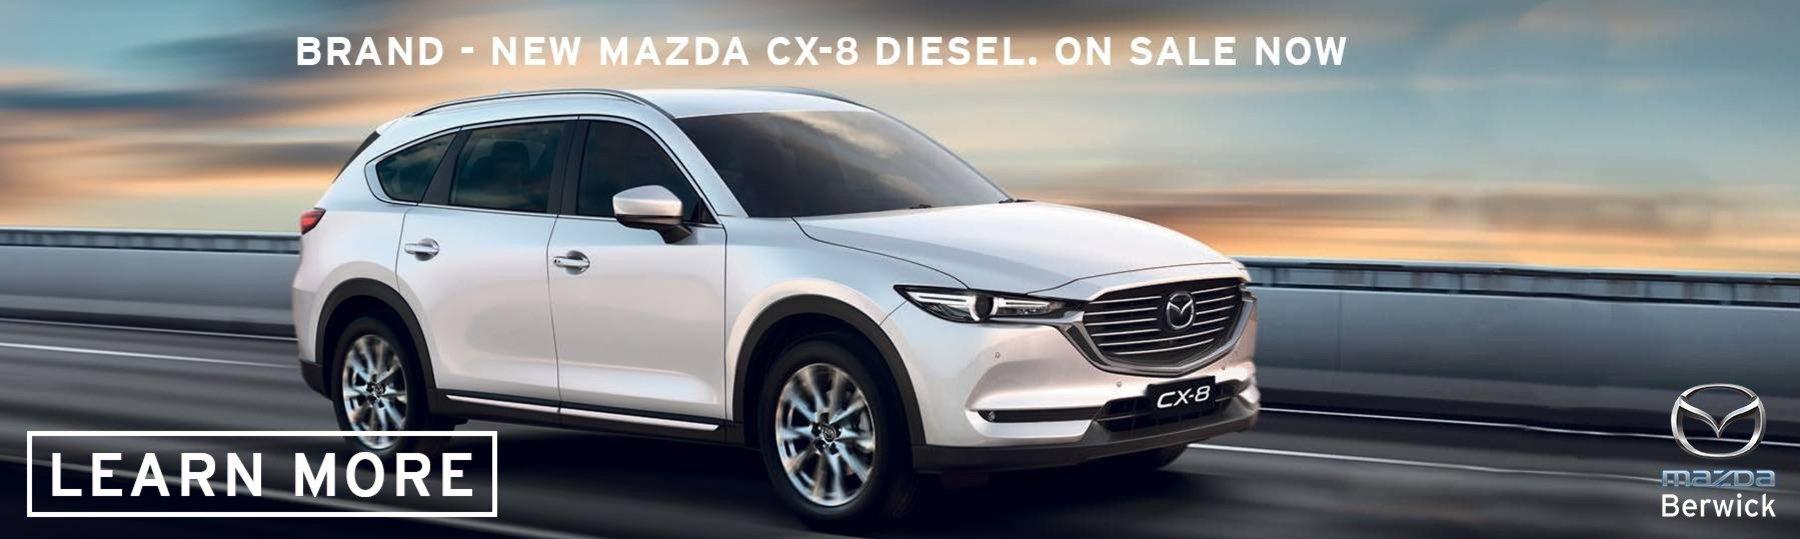 Berwick Mazdas new cx-8 diesel